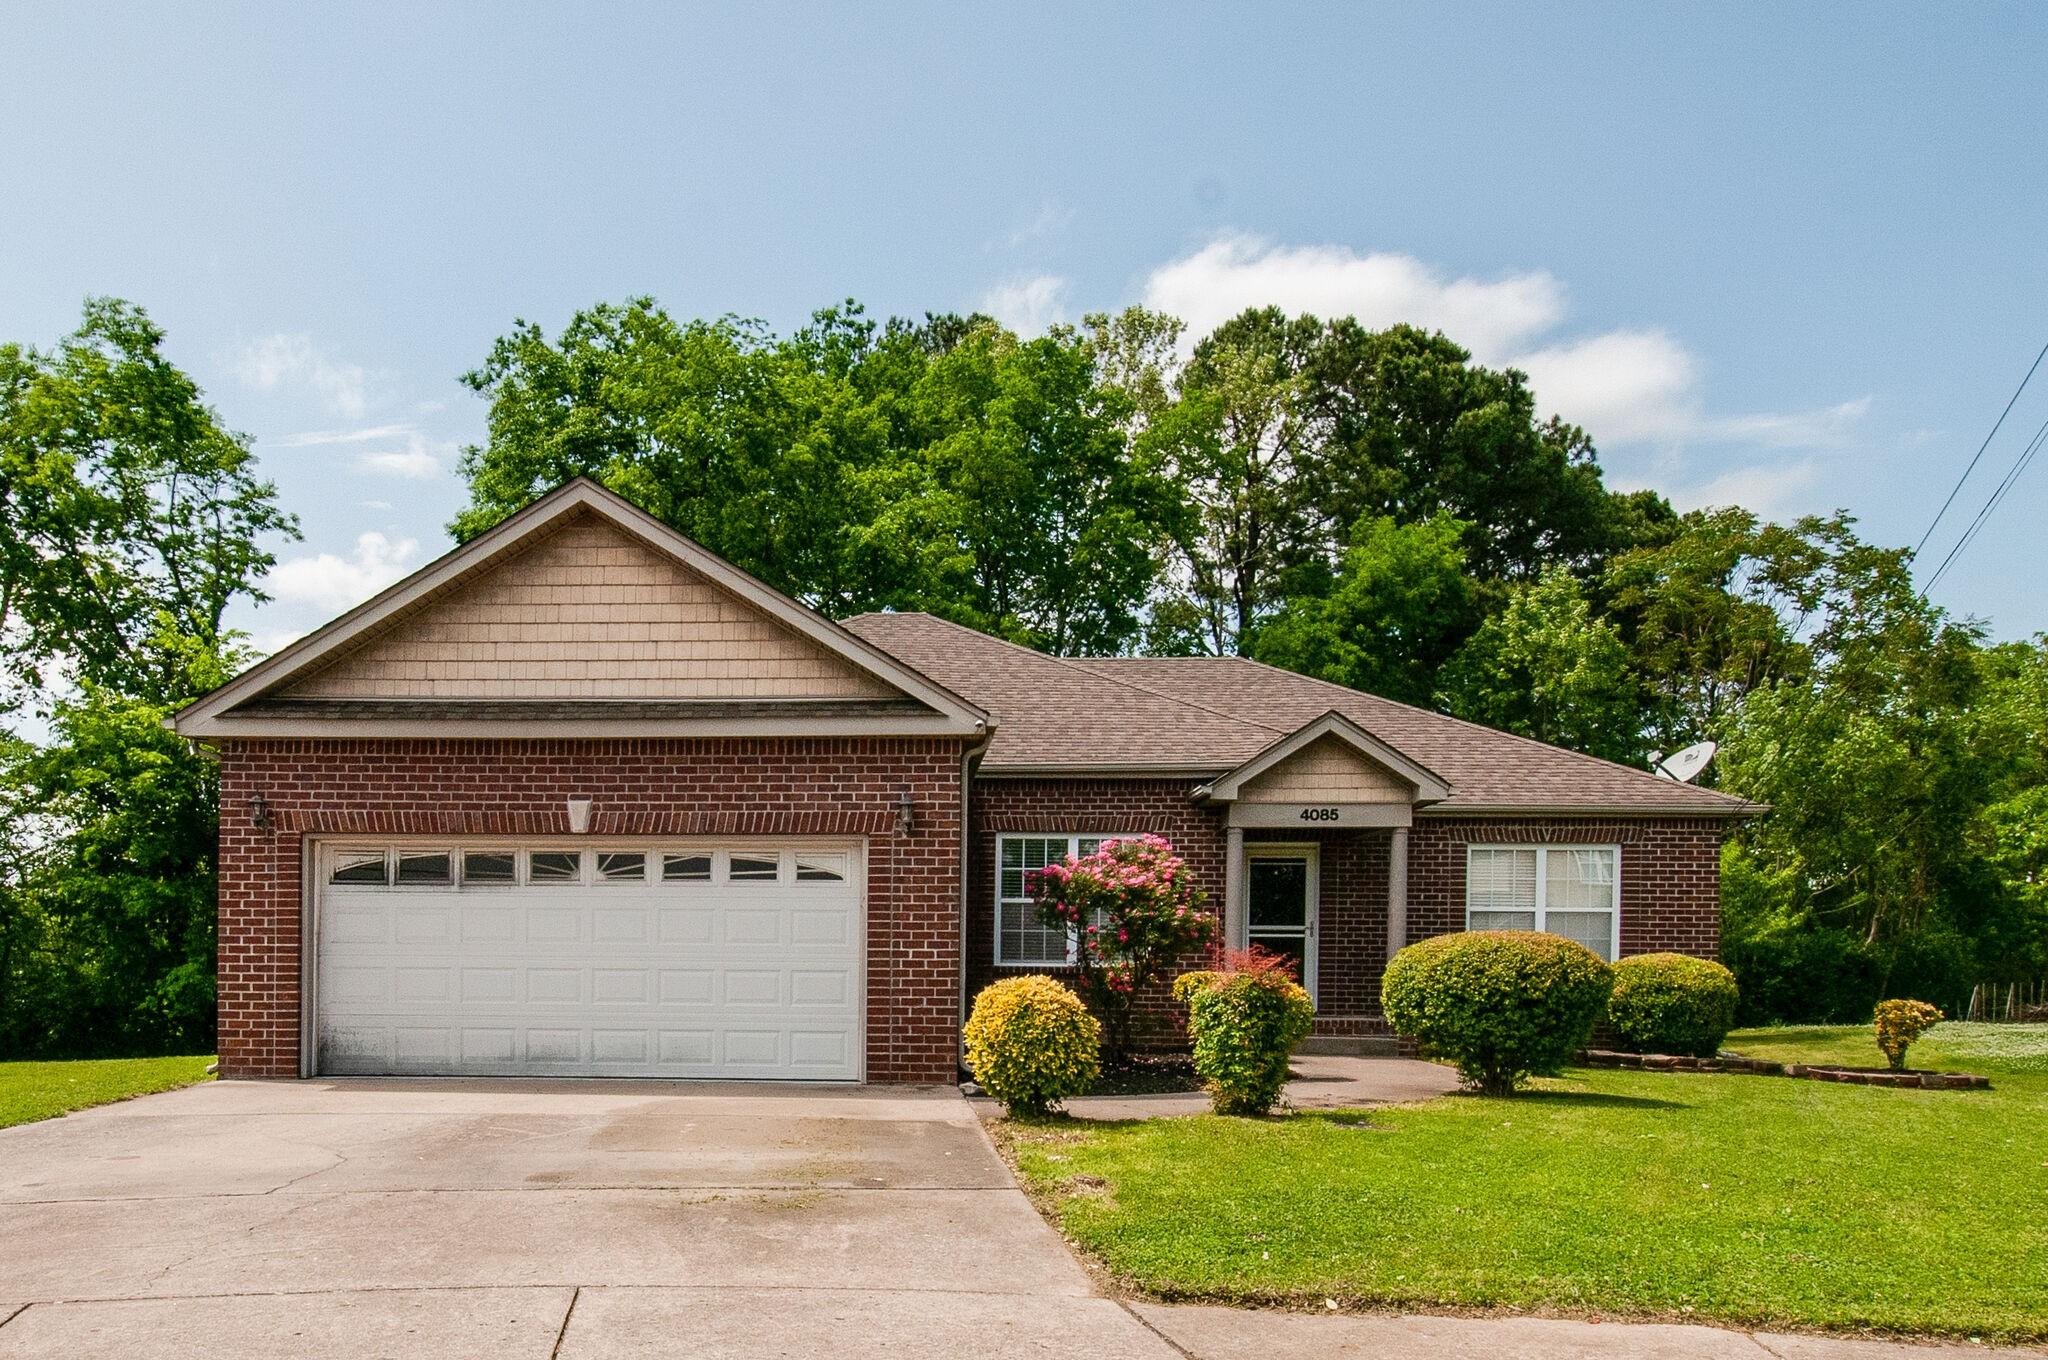 4085 Hollis Hill Dr Property Photo - Nashville, TN real estate listing